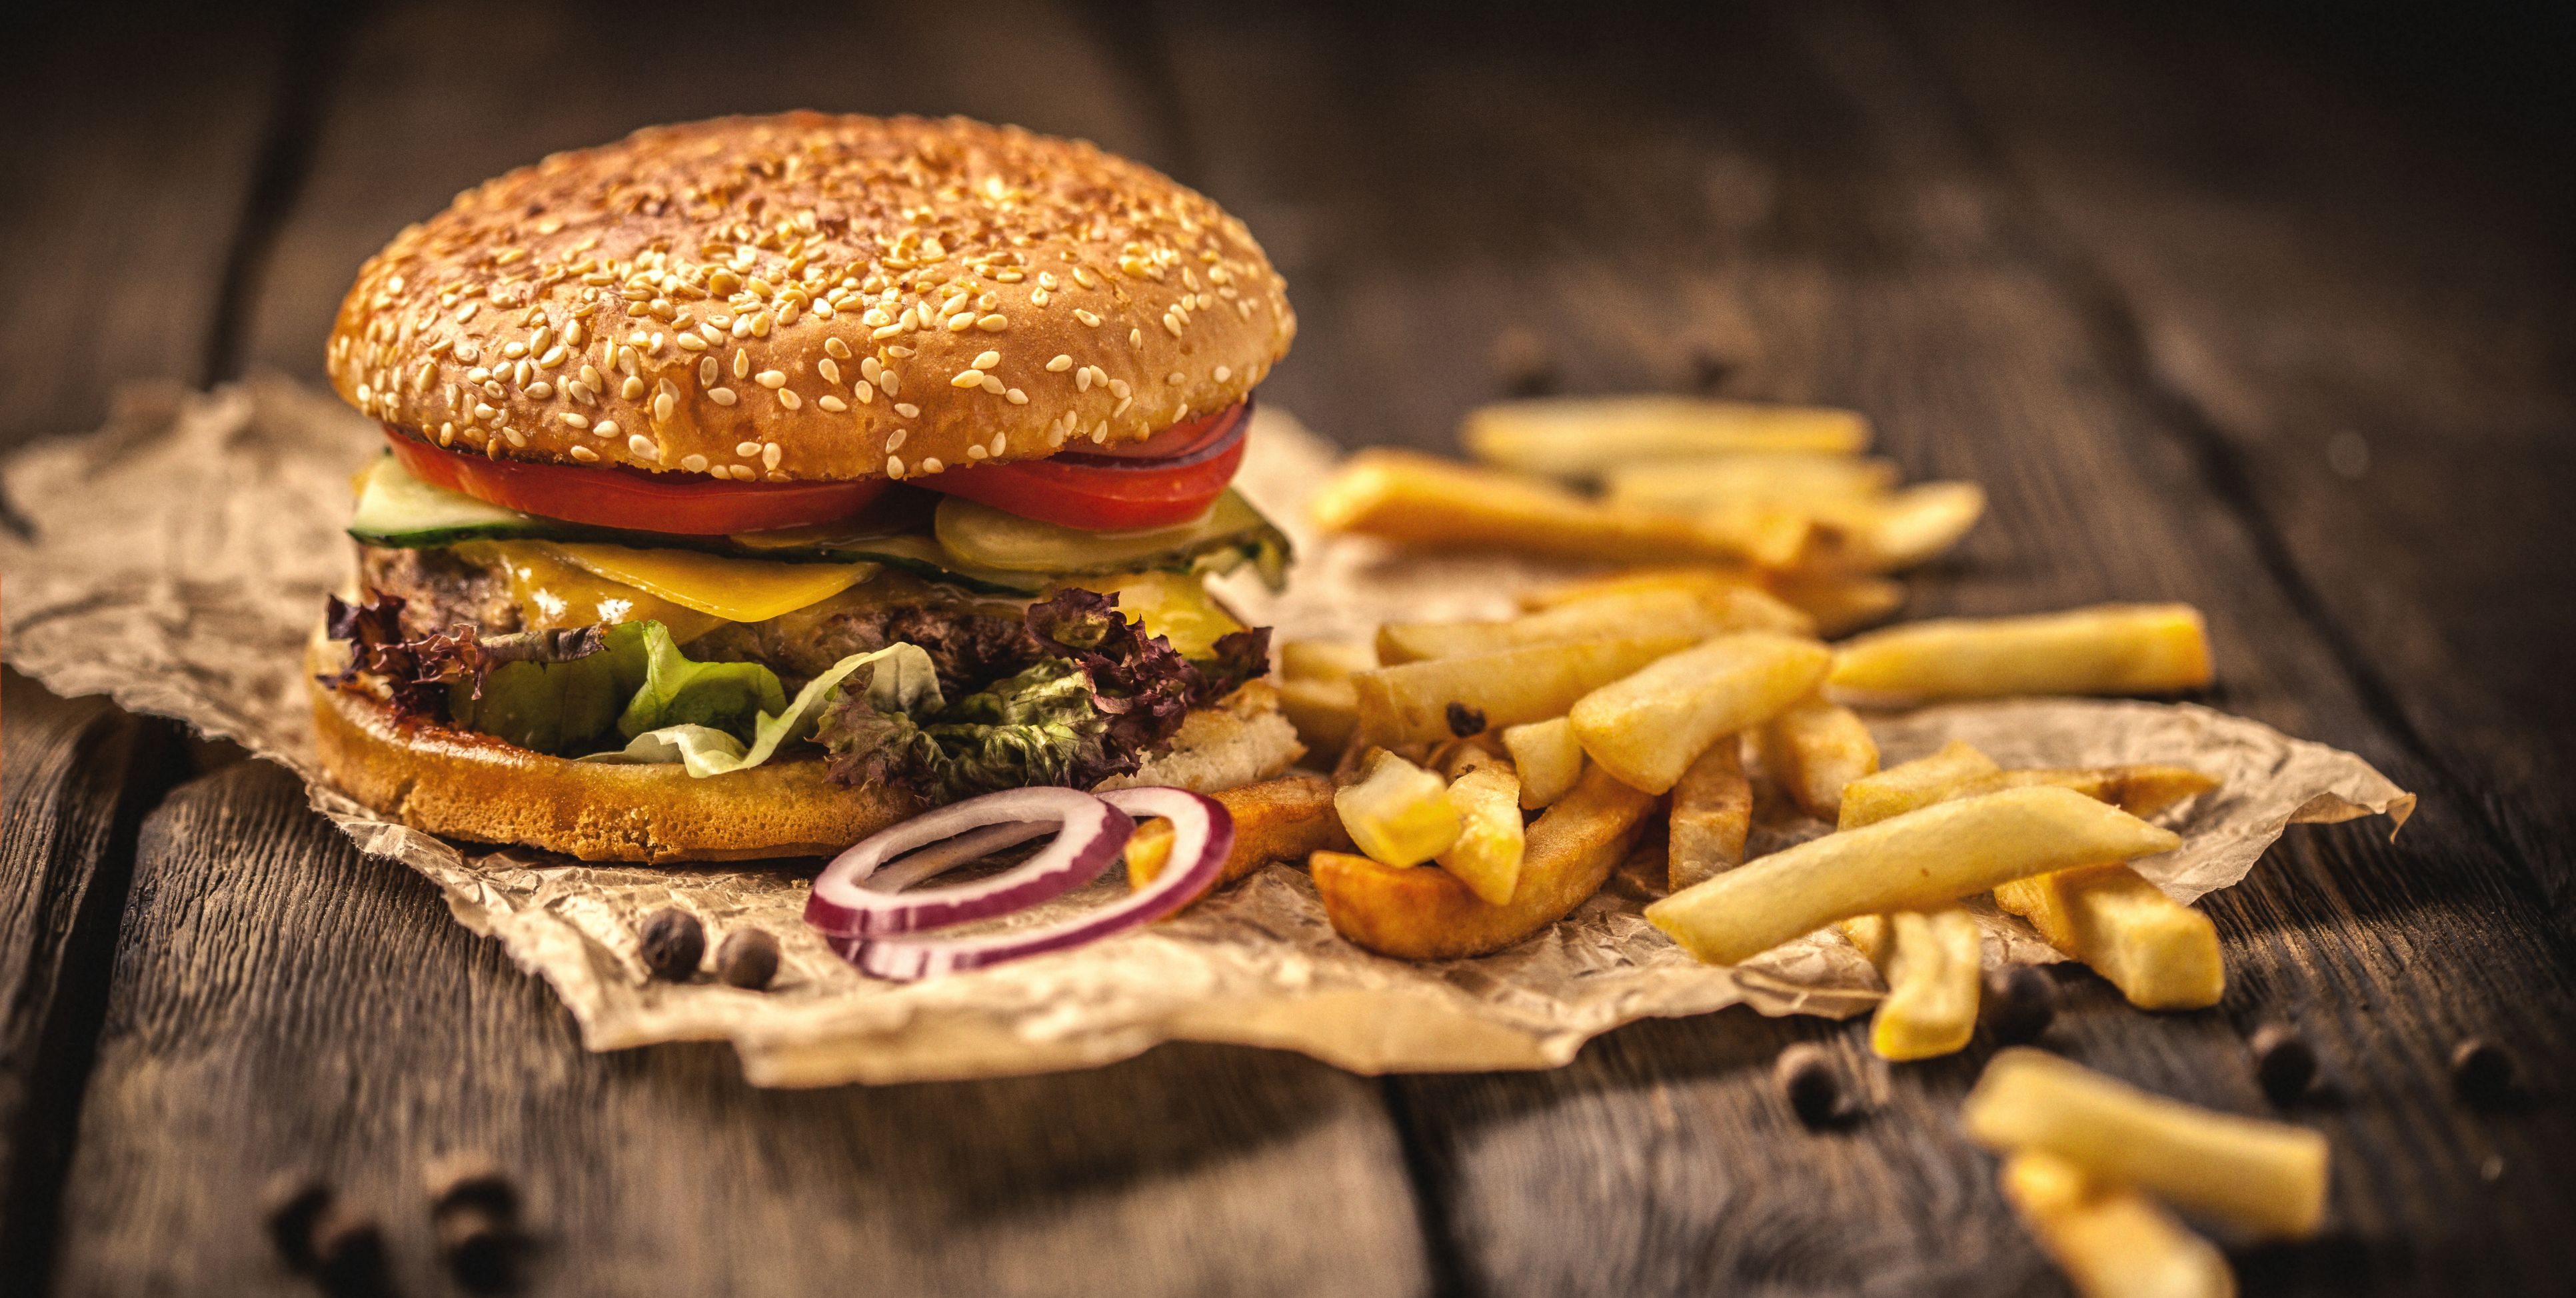 These Top Burger Chains Got Failing Grades for Their Antibiotics Policies